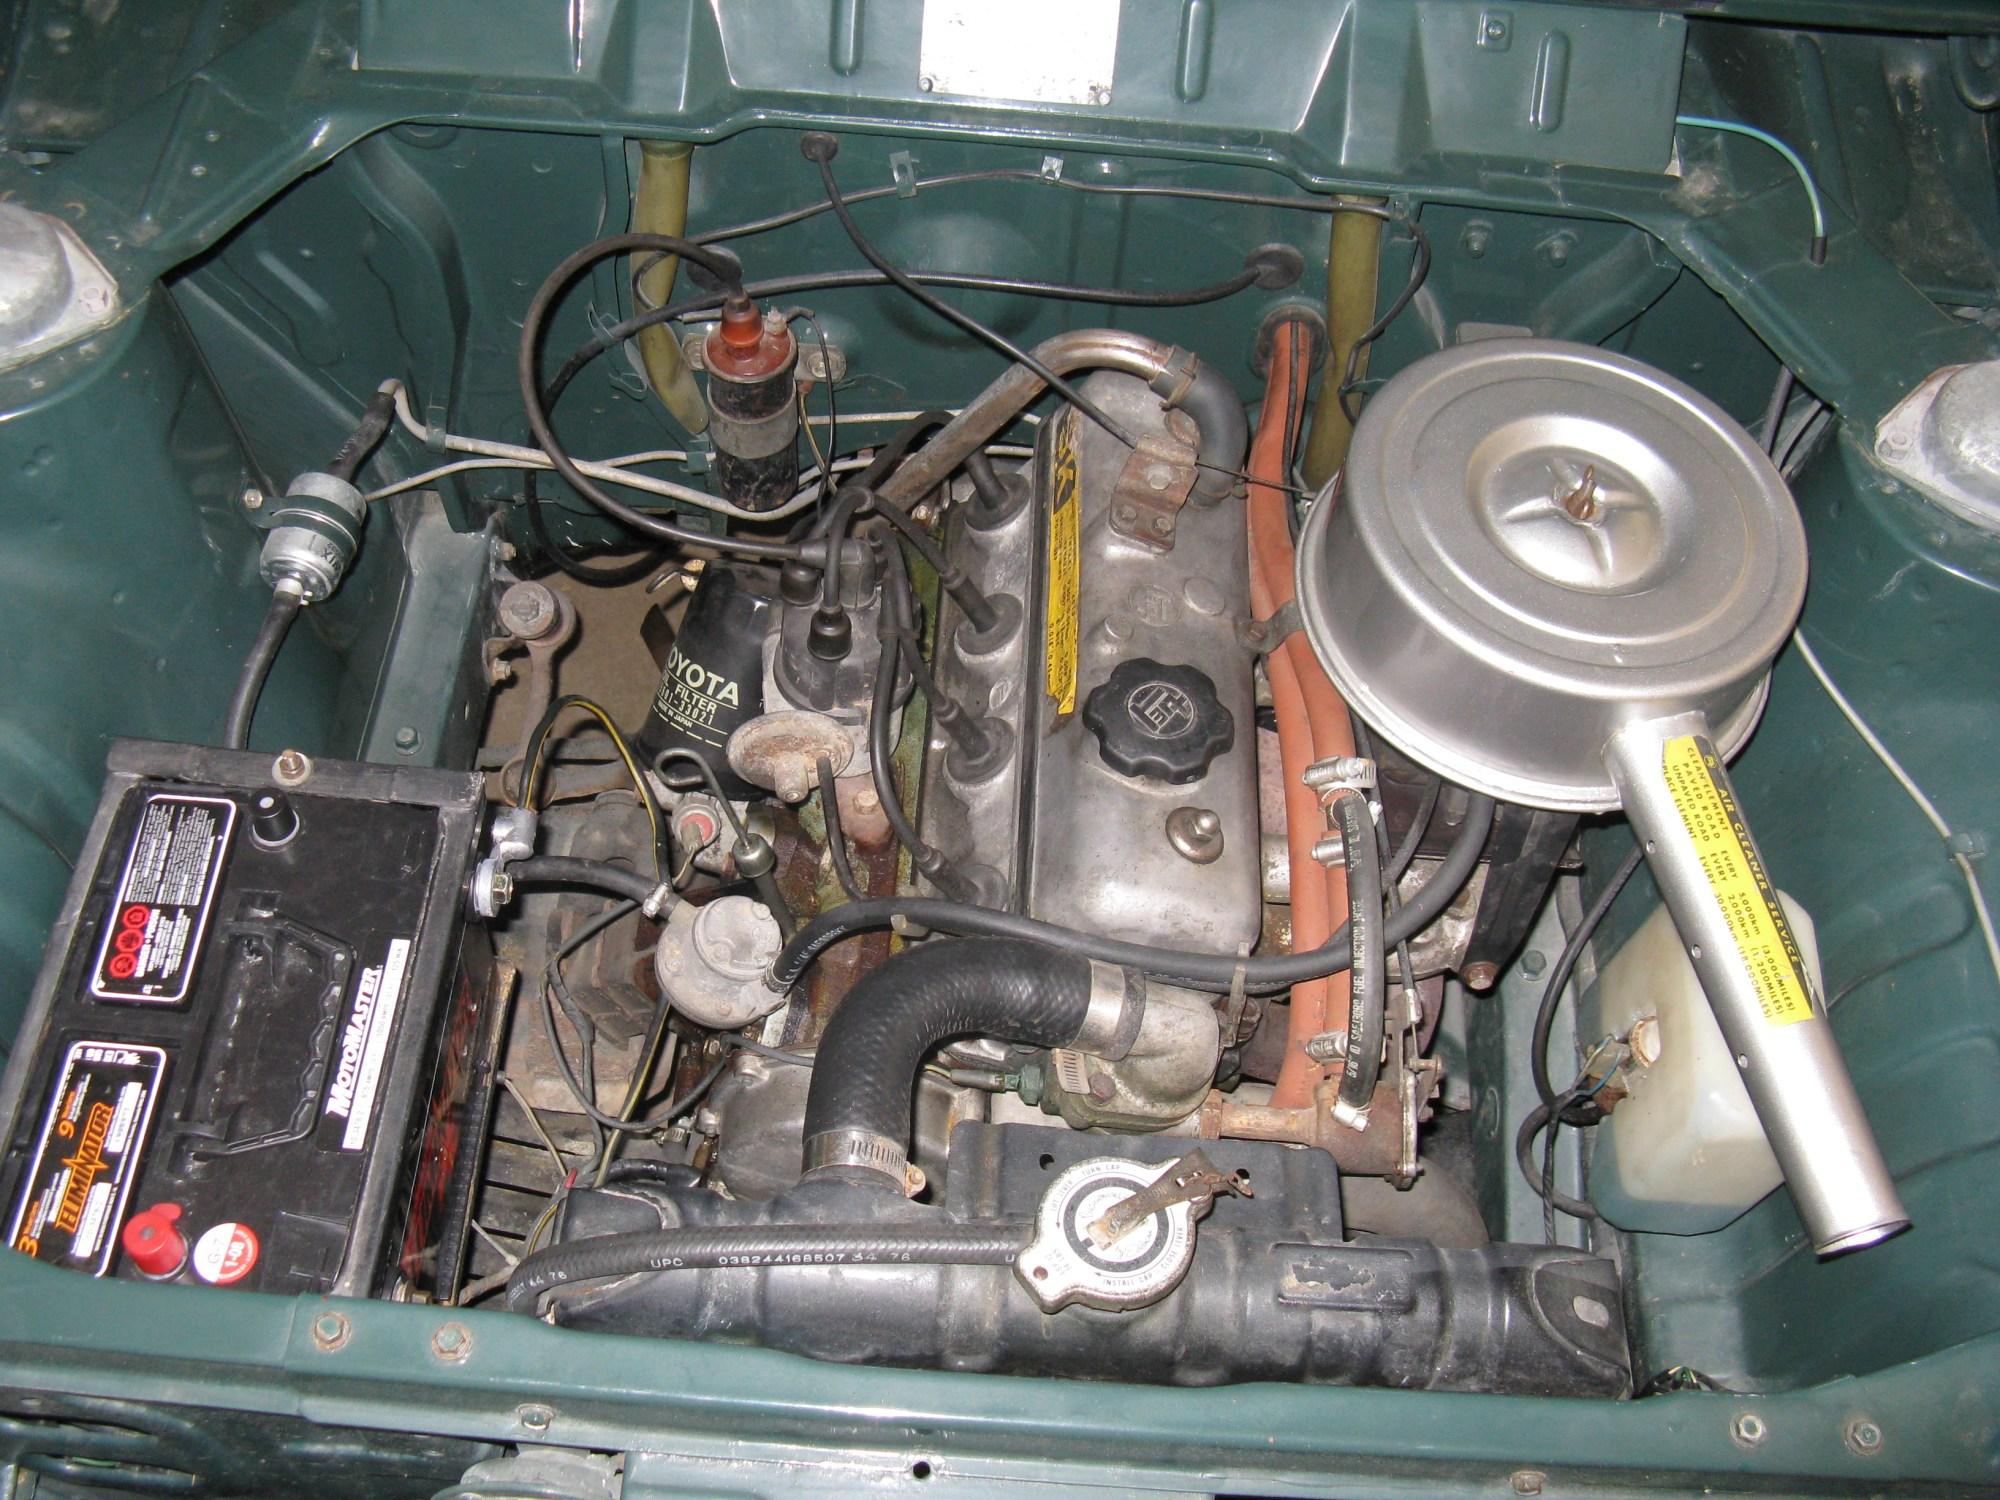 hight resolution of 5k engine service manualdownload free software programs online toyota heater blower motor wiring diagram toyota alternator wiring diagram 5k